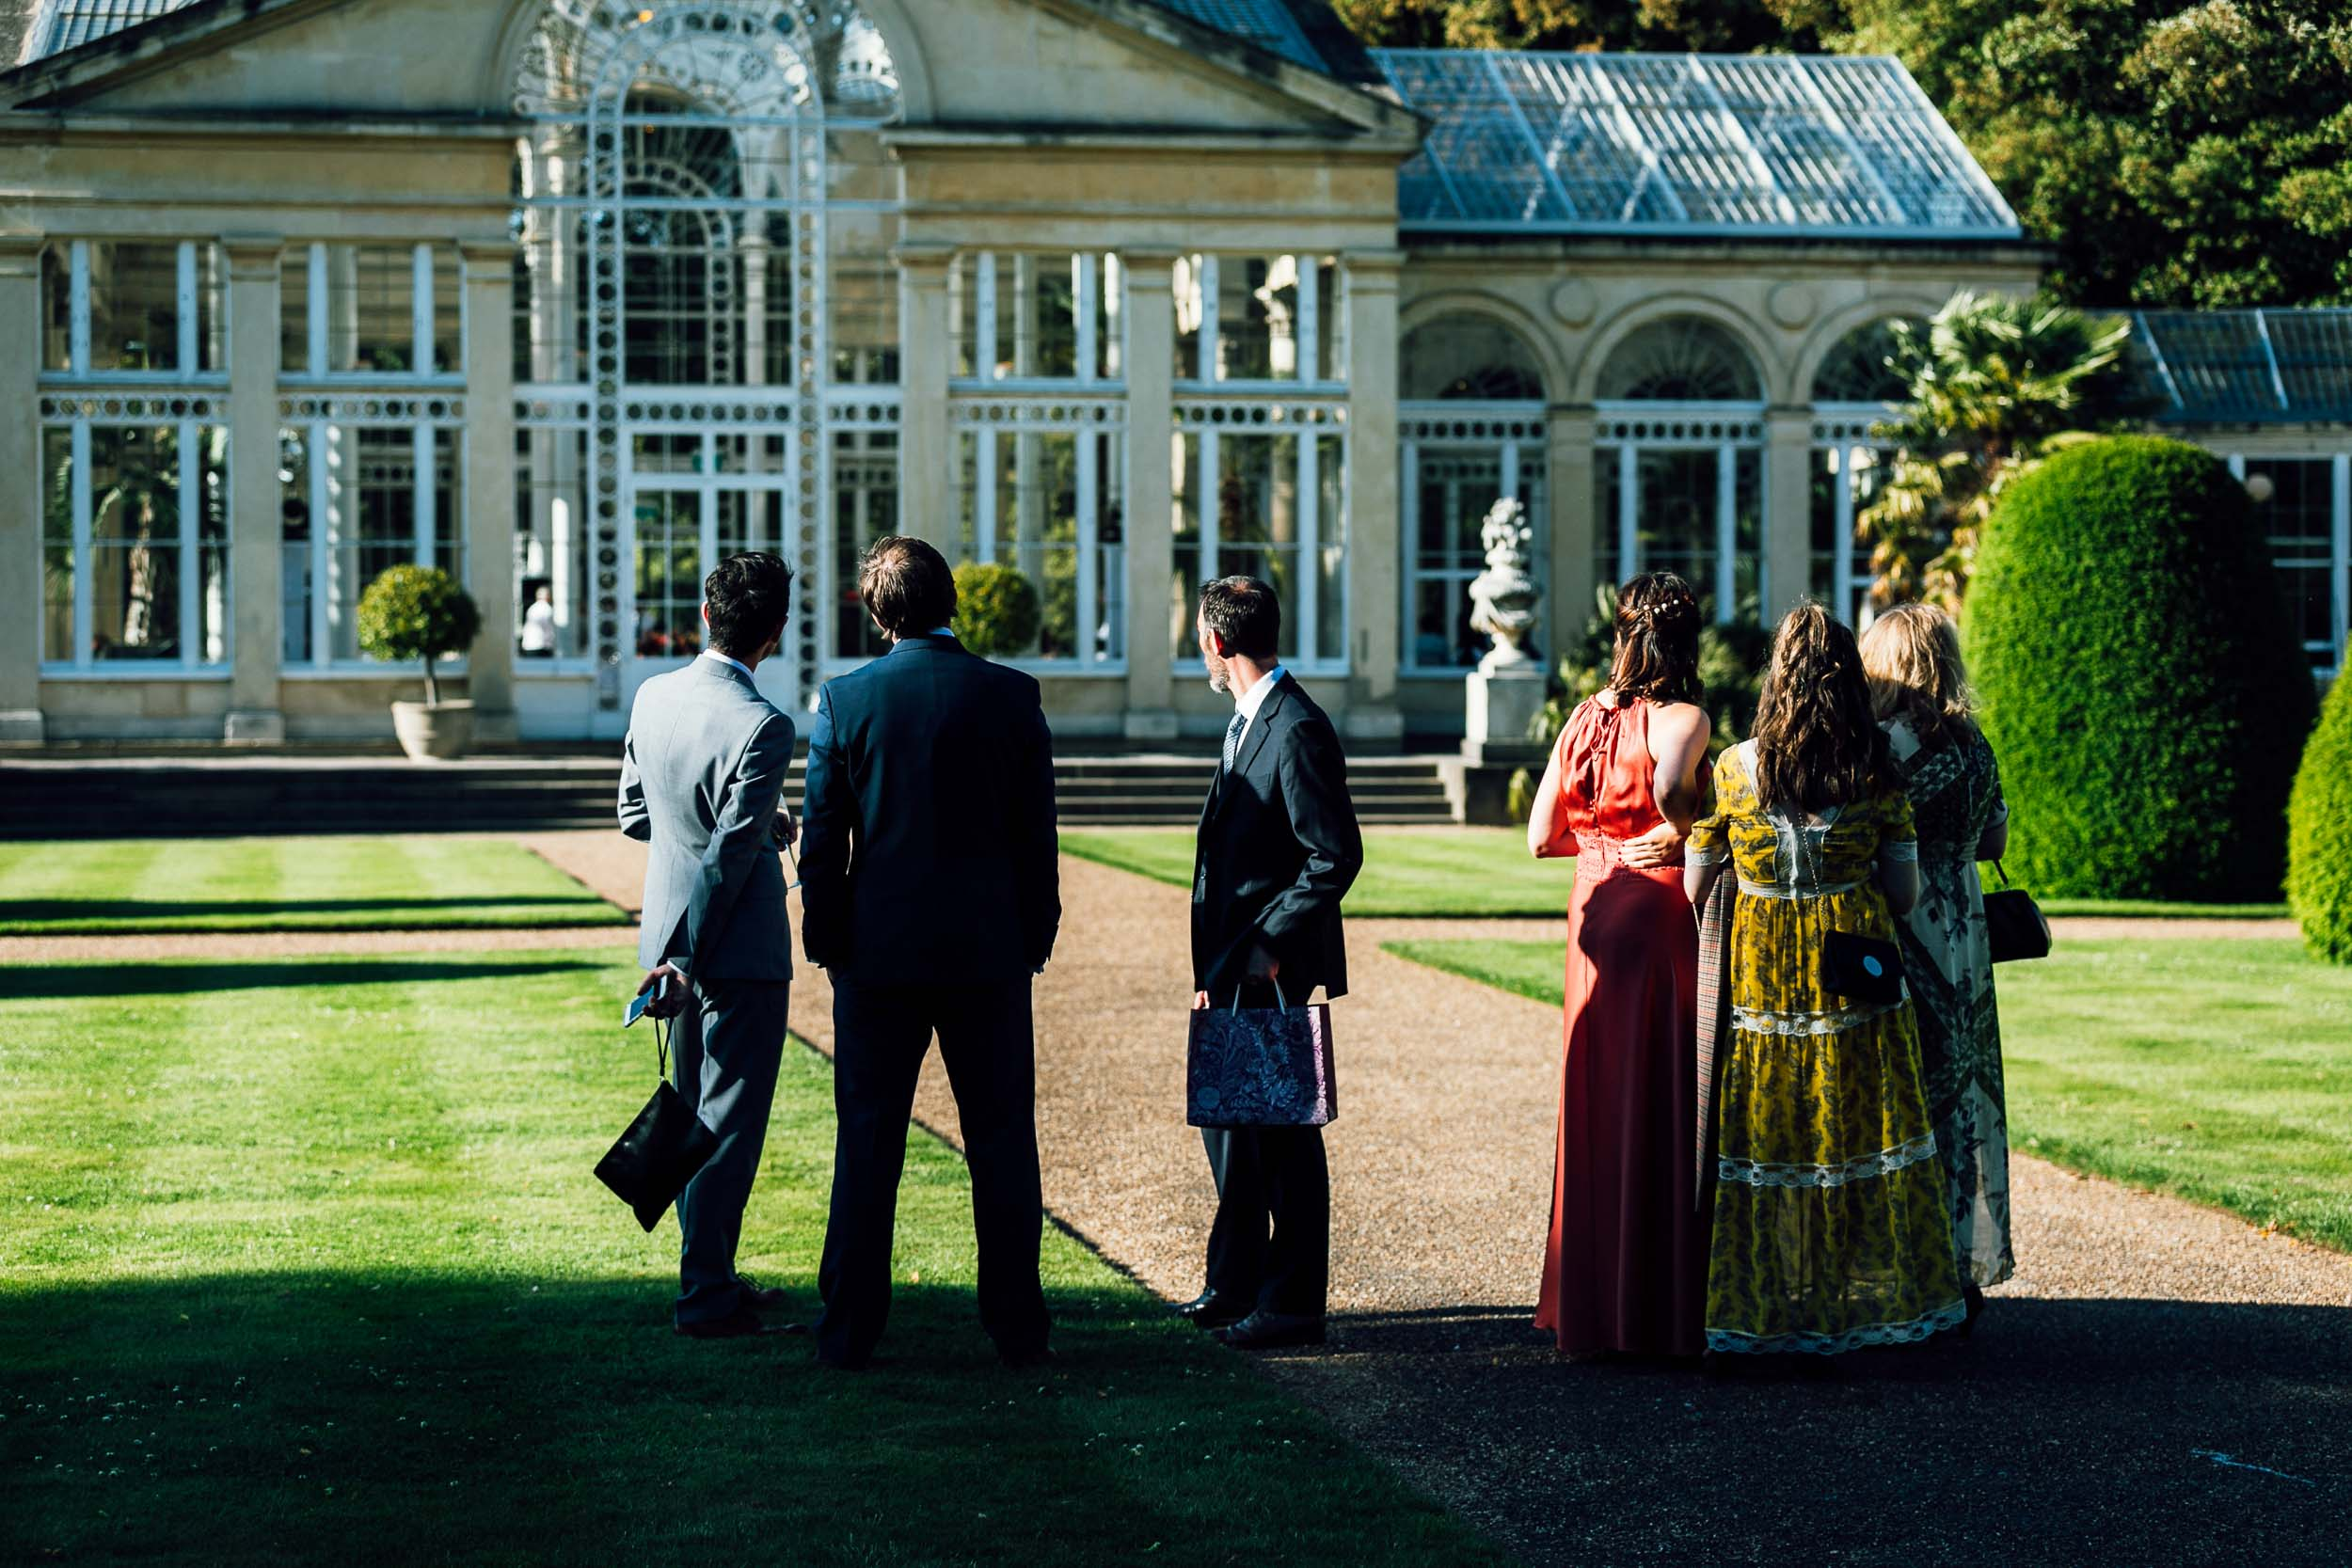 syon-house-wedding-photographer-london 114.jpg